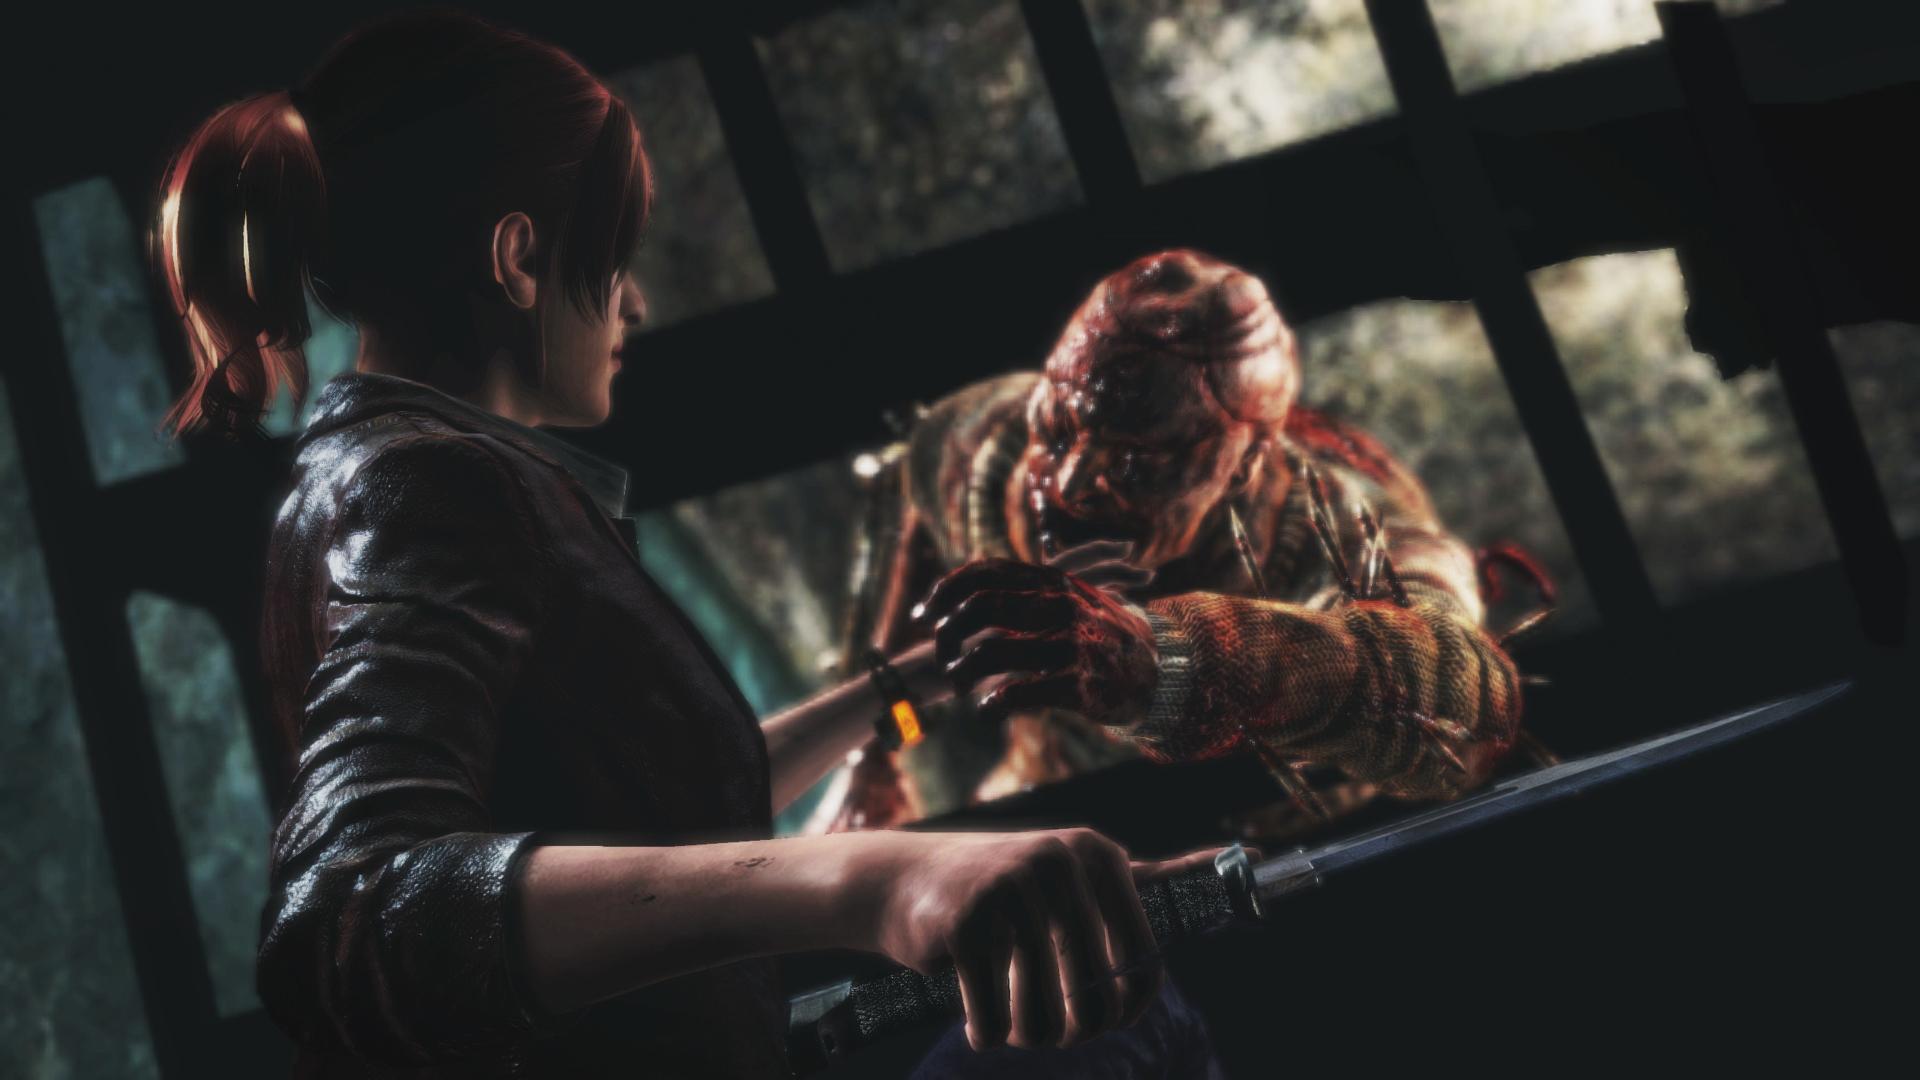 Resident Evil Revelations 2 ESPAÑOL PC Full + Update 2.1 (CODEX) + REPACK 3 DVD5 (JPW) 5